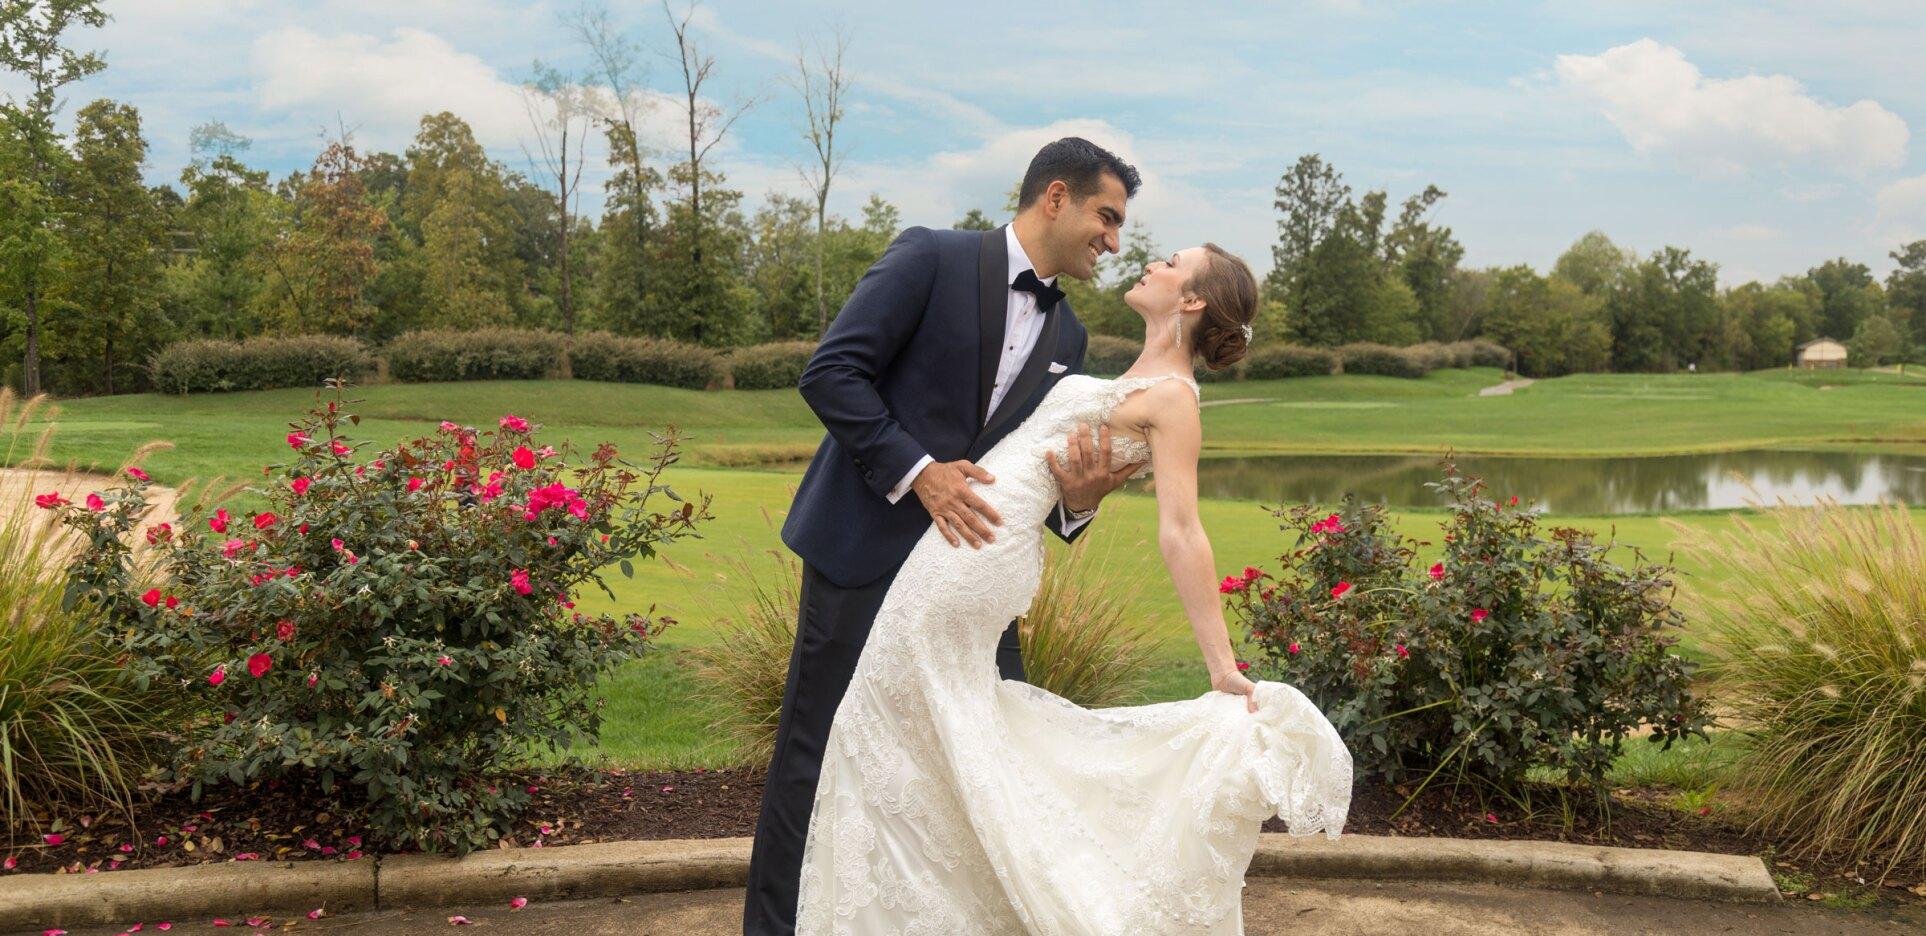 1757 Golf Club, Weddings in Northern Virginia